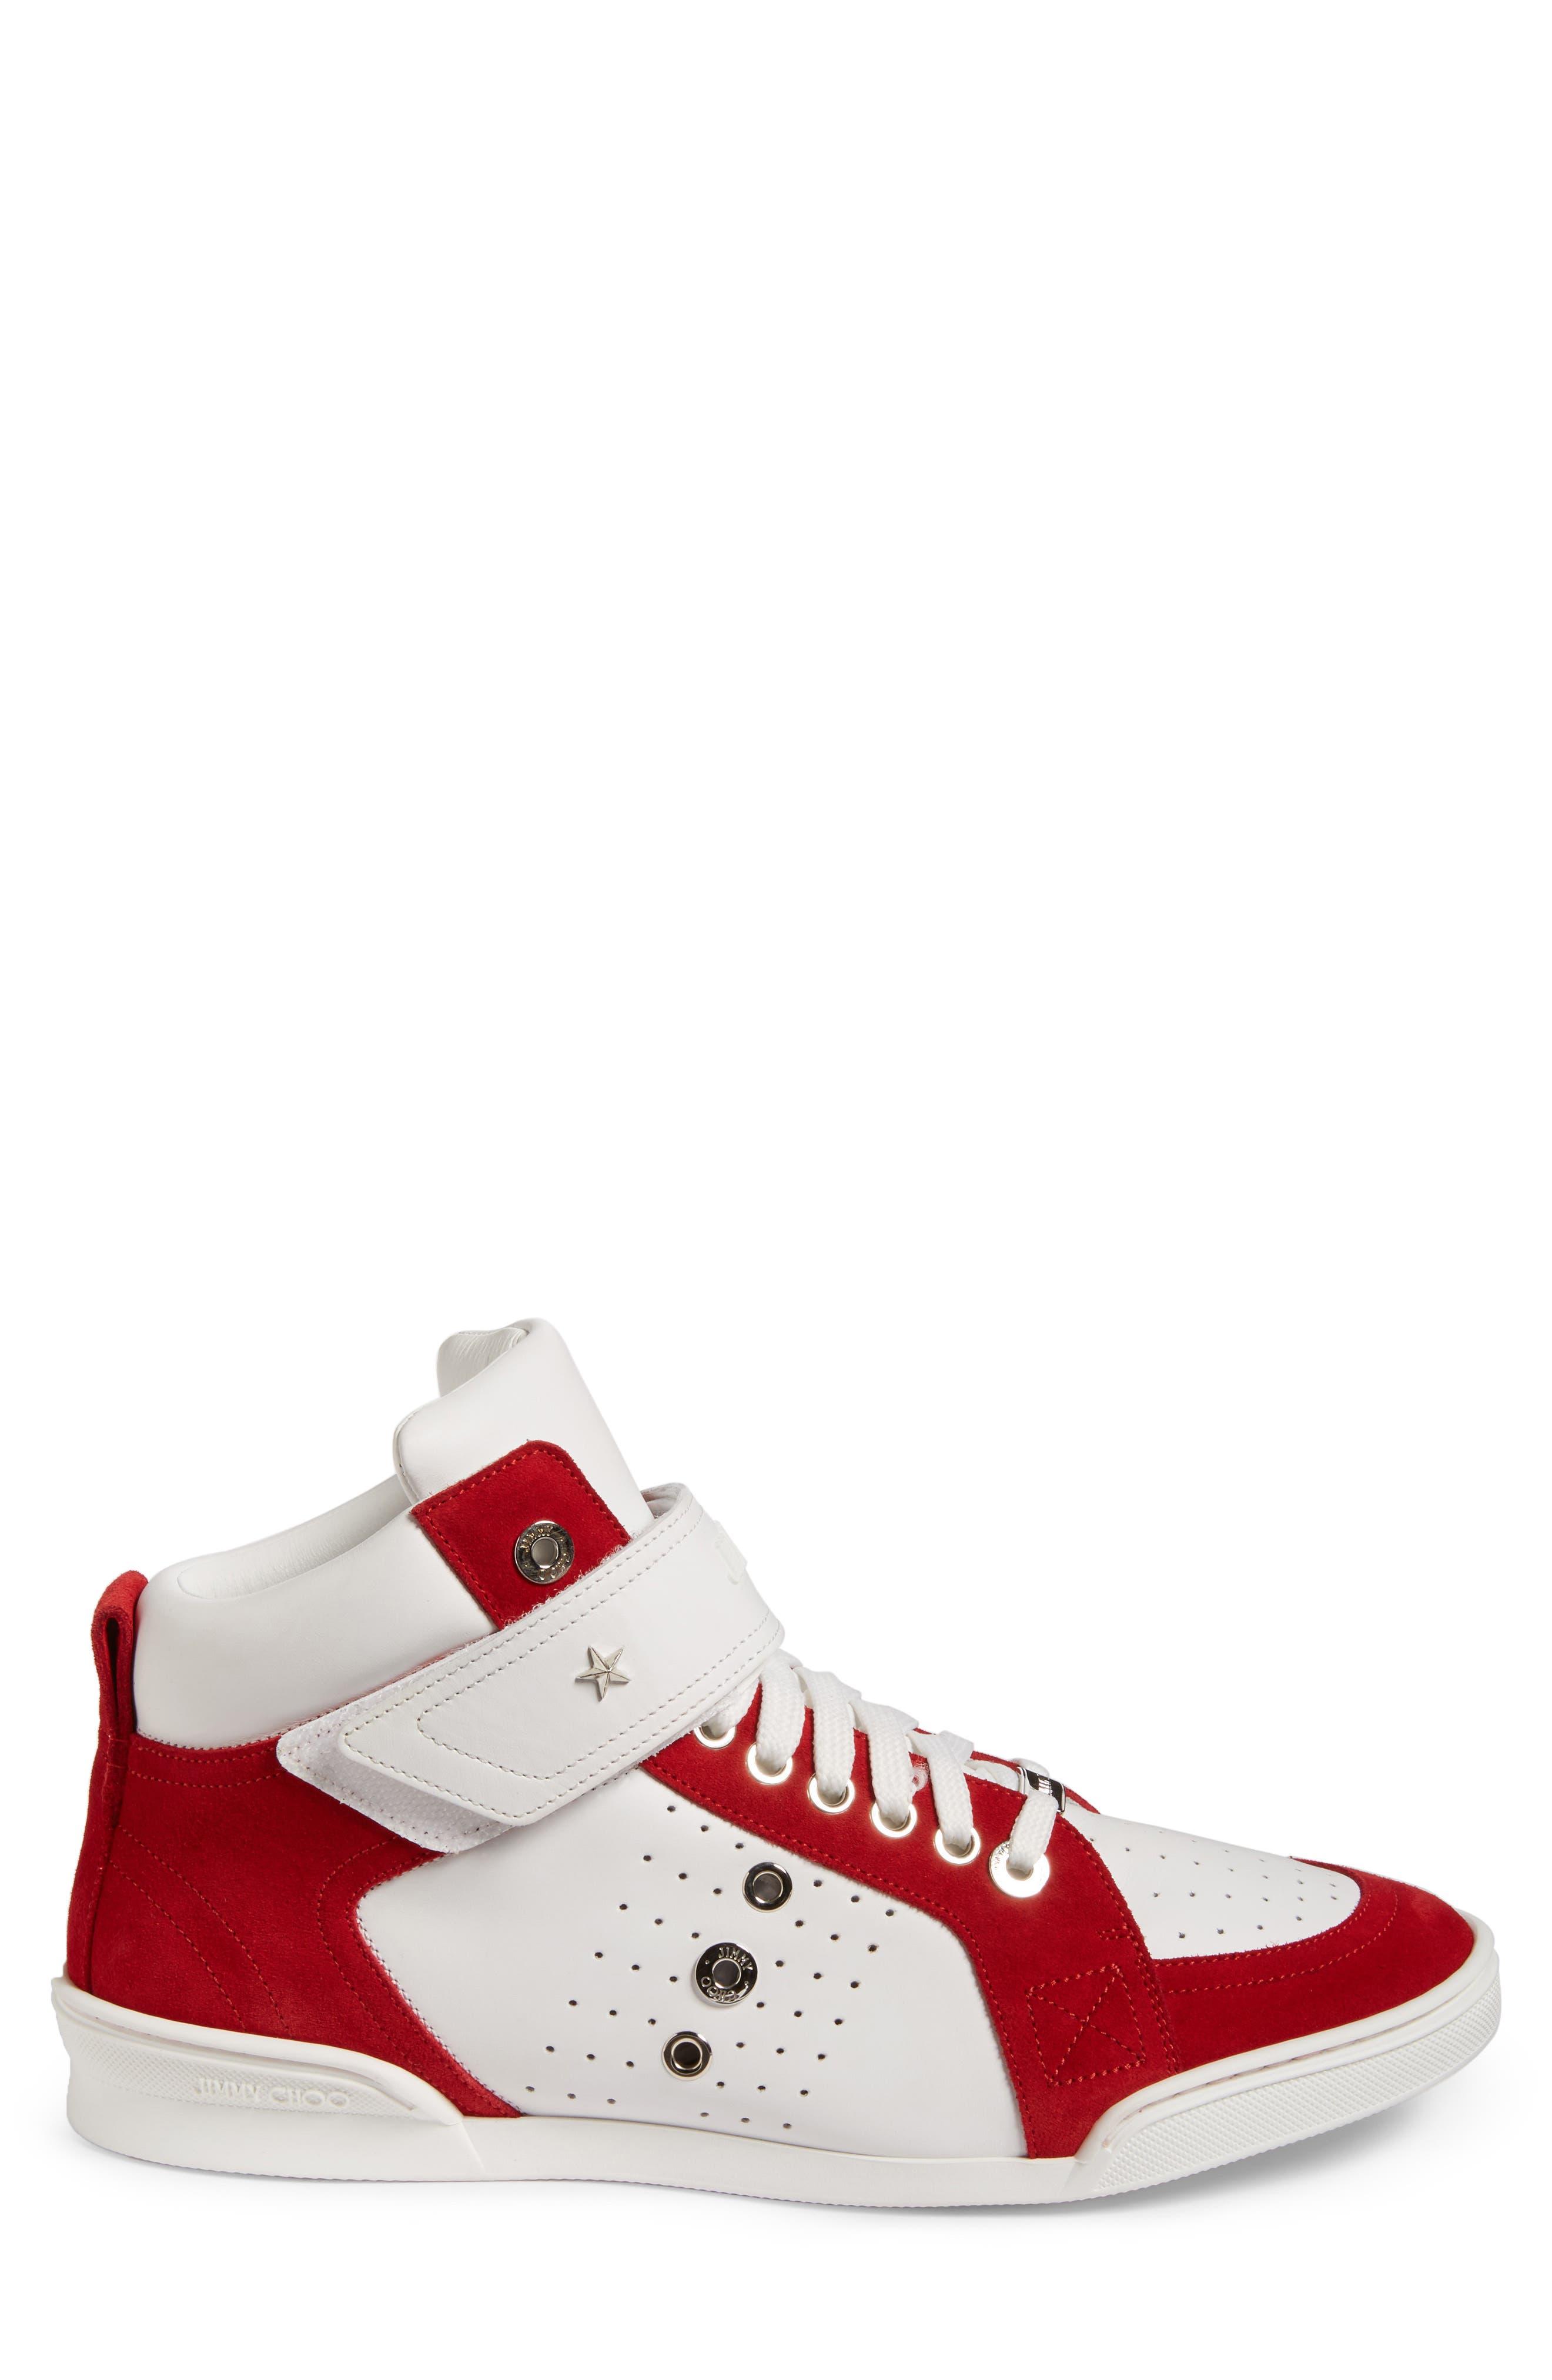 Lewis Sneaker,                             Alternate thumbnail 3, color,                             100